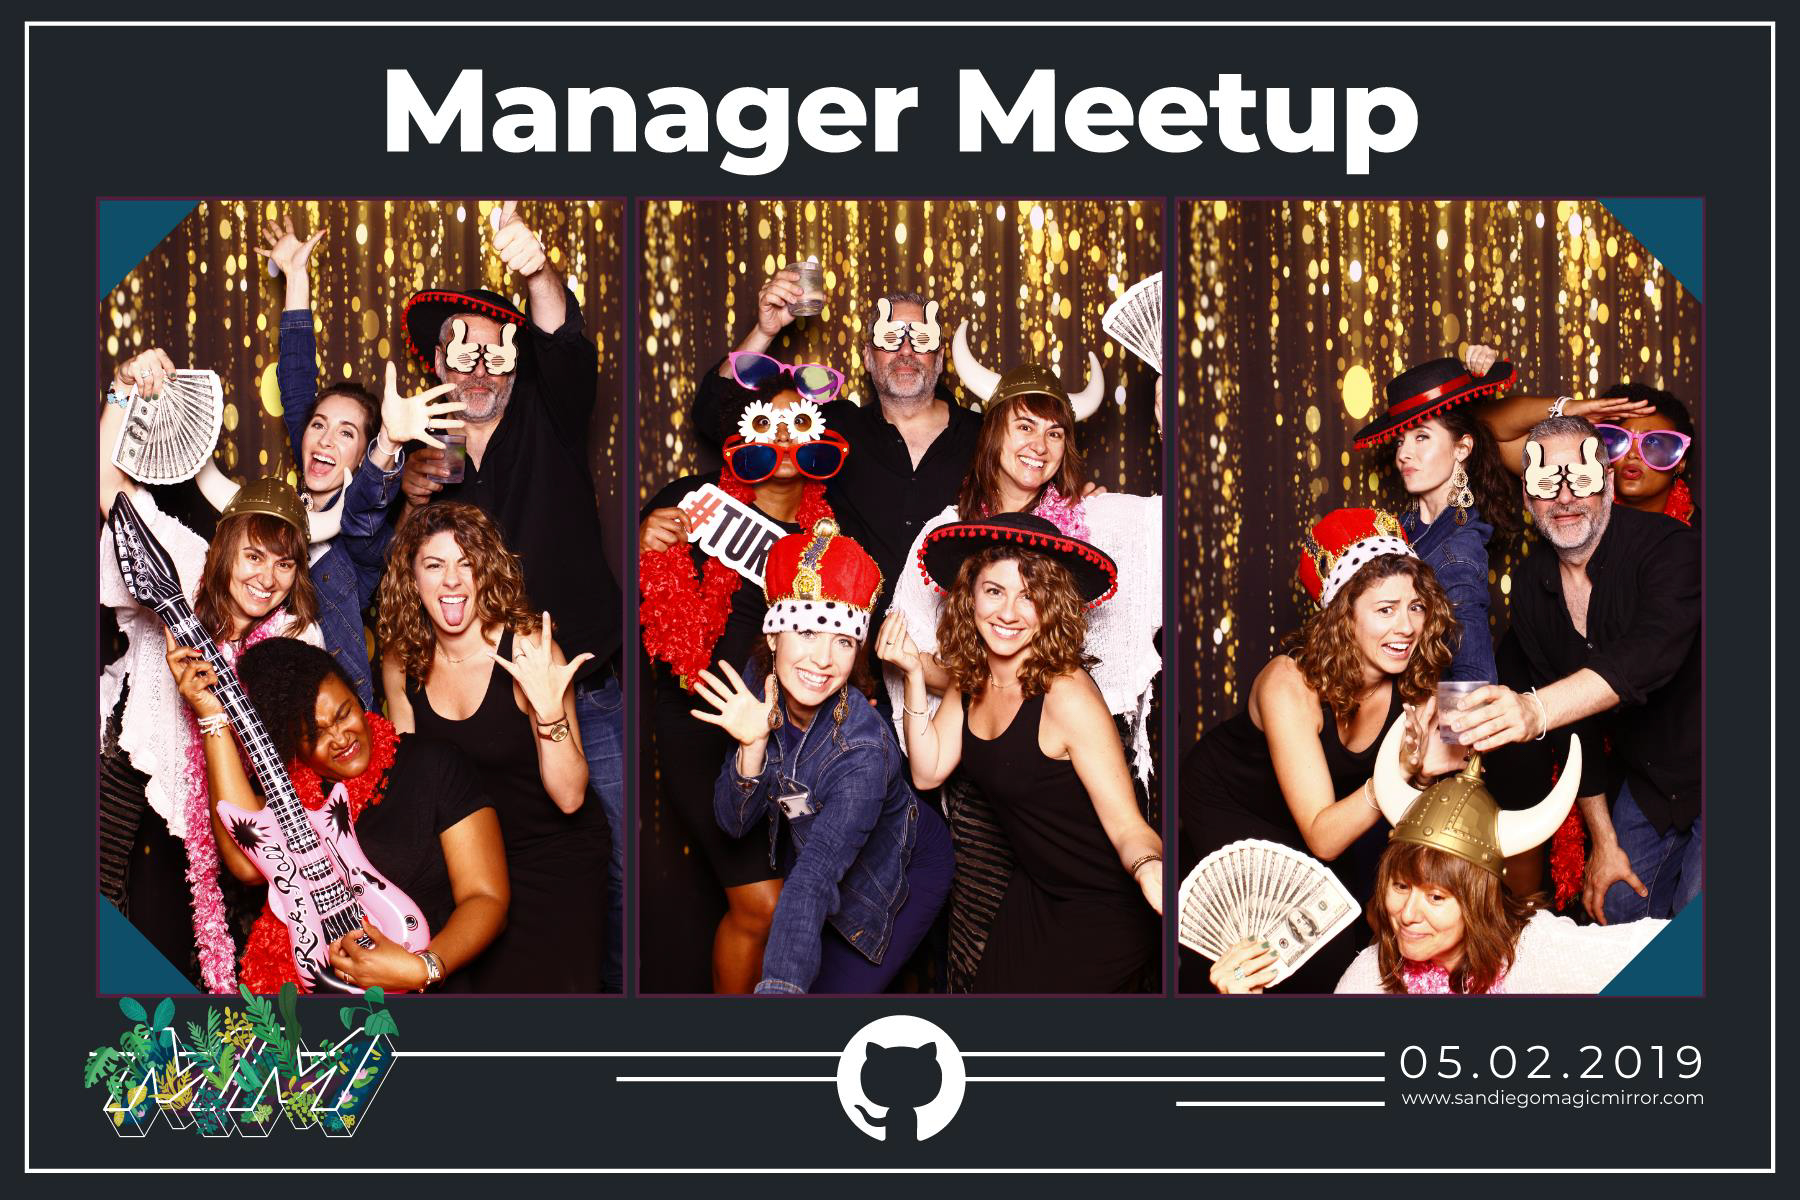 San Diego Magic Mirror Photo Booth Corporate Meetup